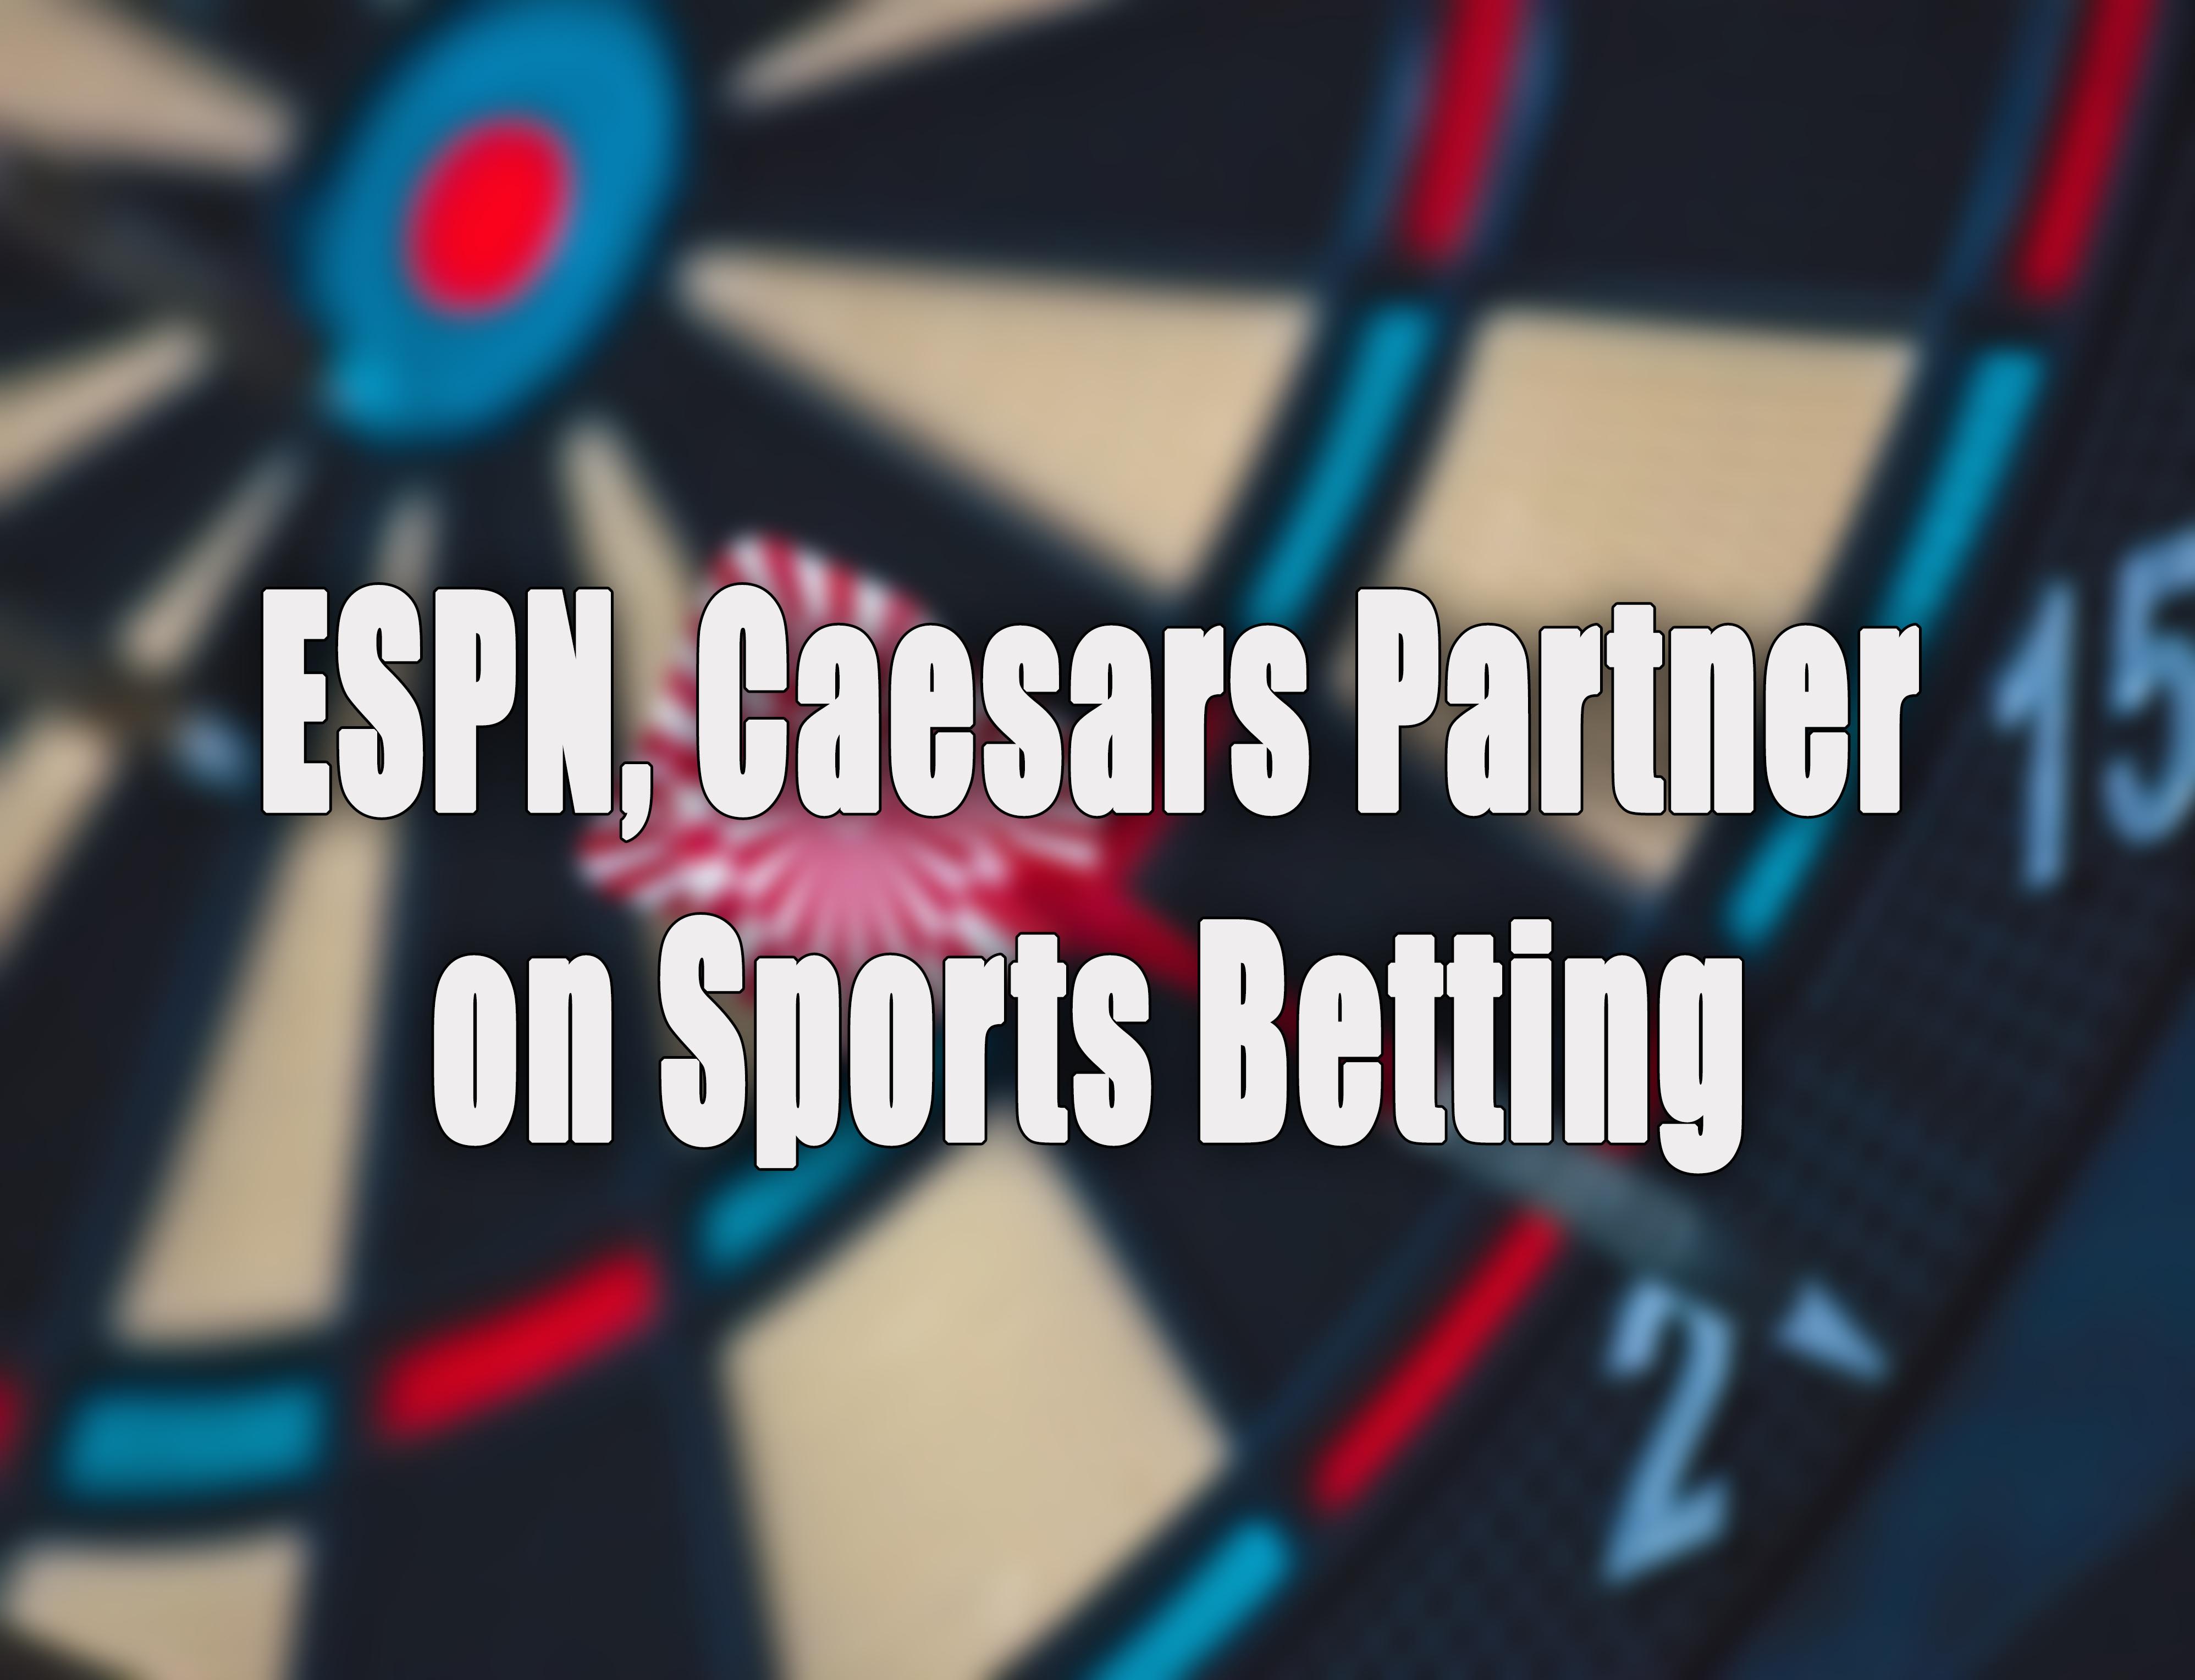 ESPN Sports Betting.jpg